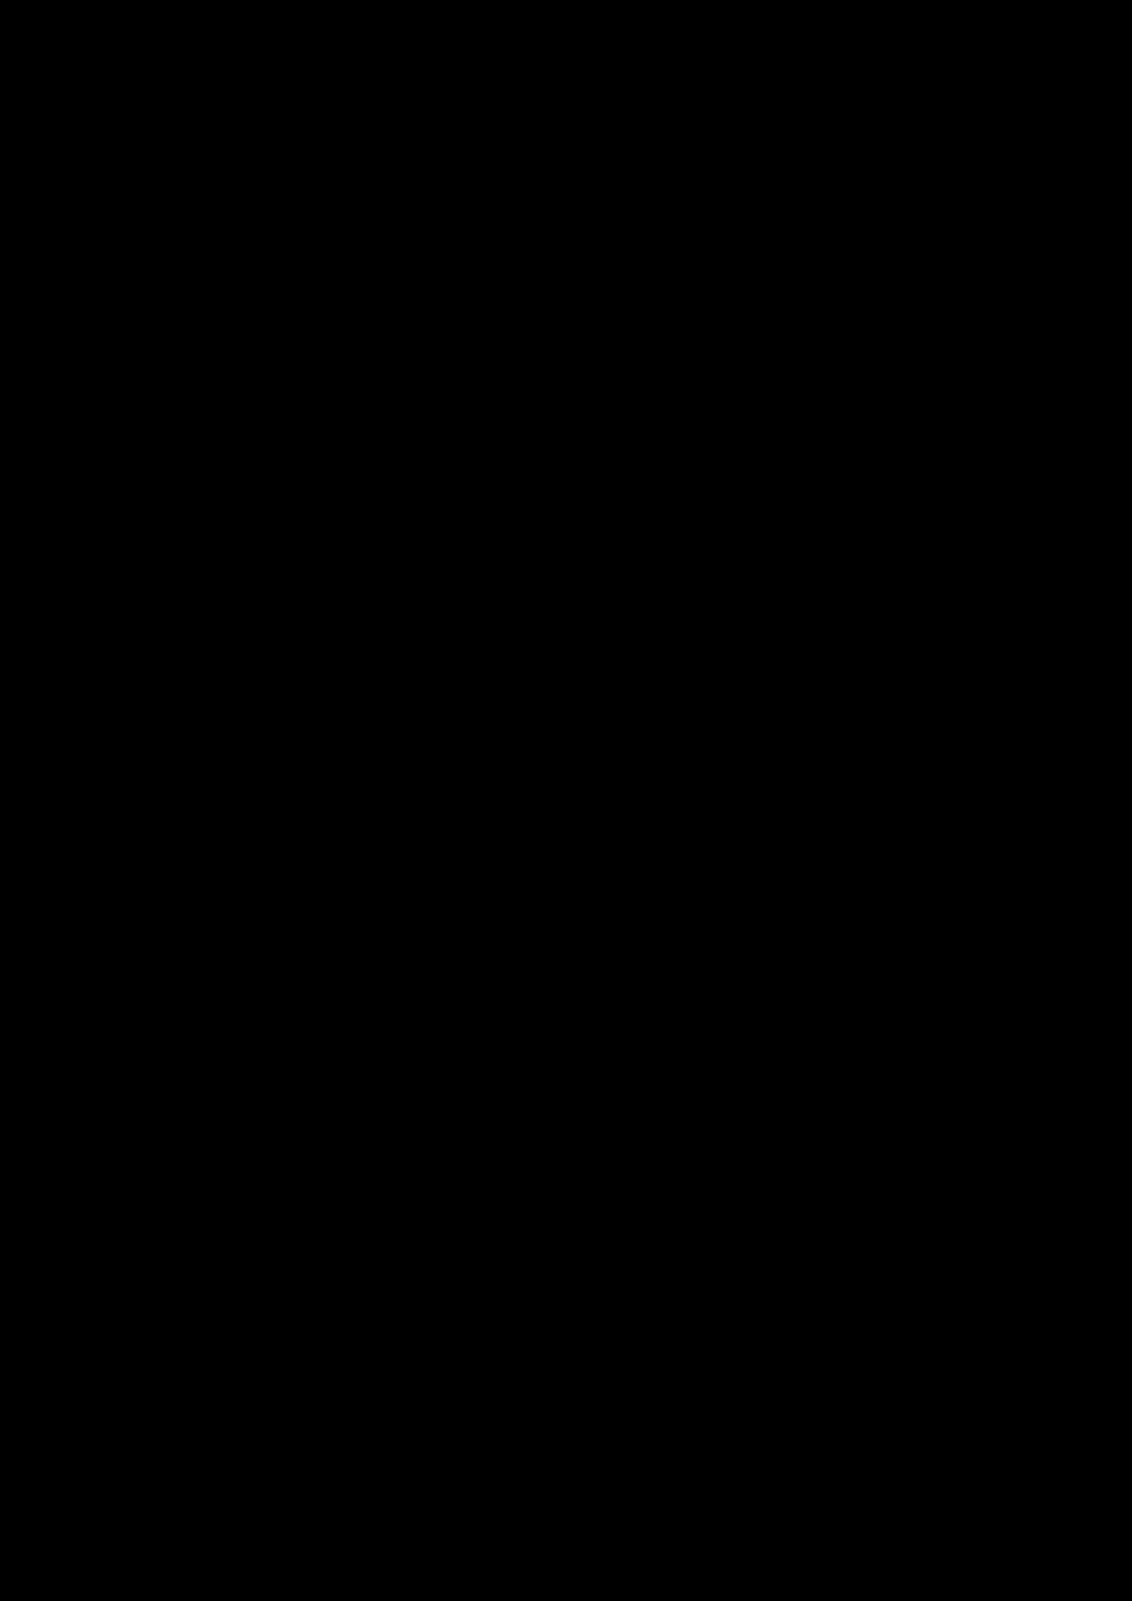 Ot Bolshogo Uma slide, Image 14